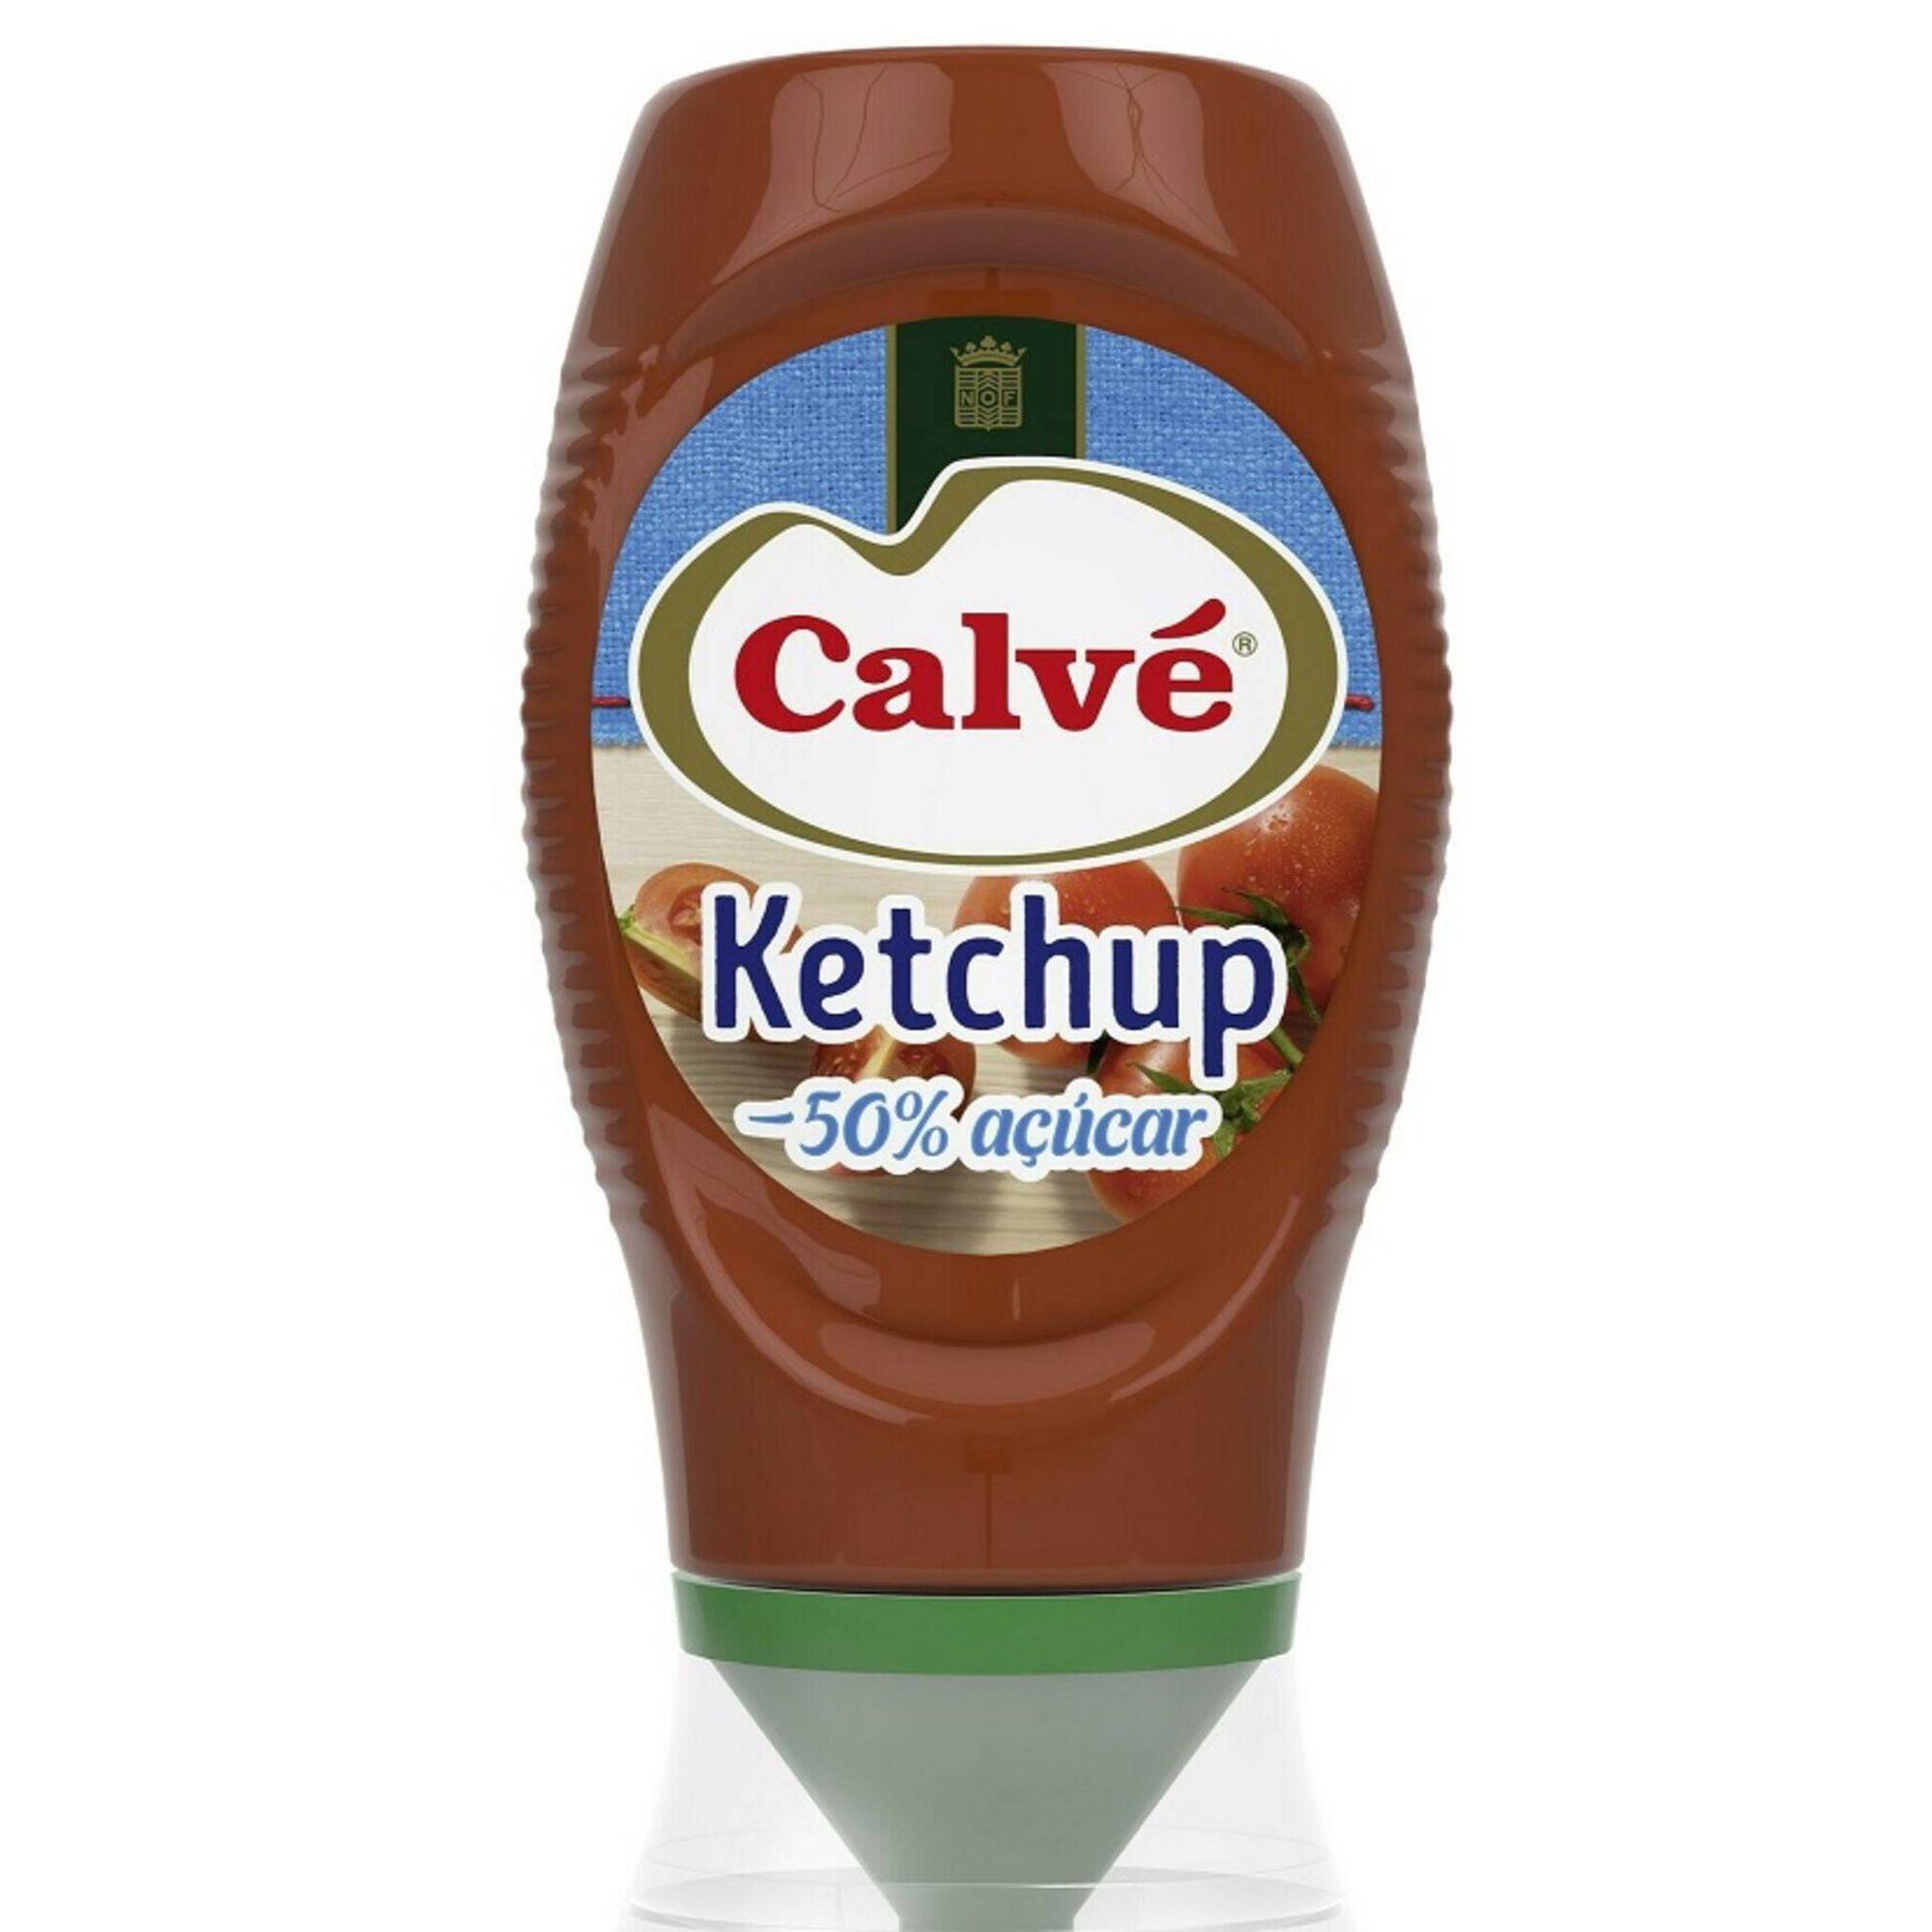 Ketchup -50% Açúcar Top Down